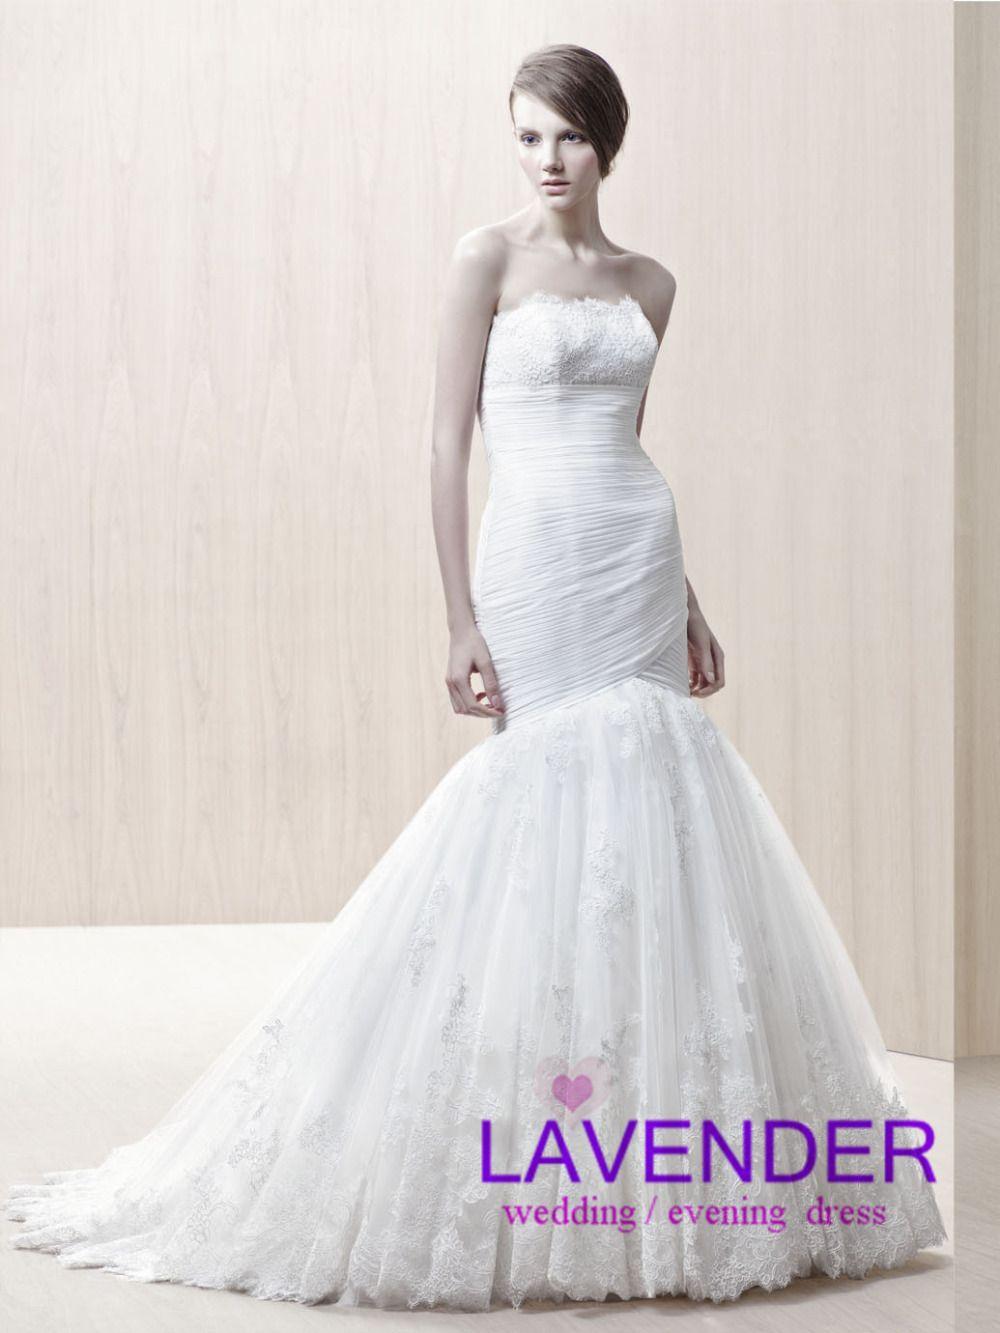 Fashion sexy mermaid wedding dress 2014 new high quality custom bridal gowns vestidos de novia vintage bride dress free shipping US $249.00